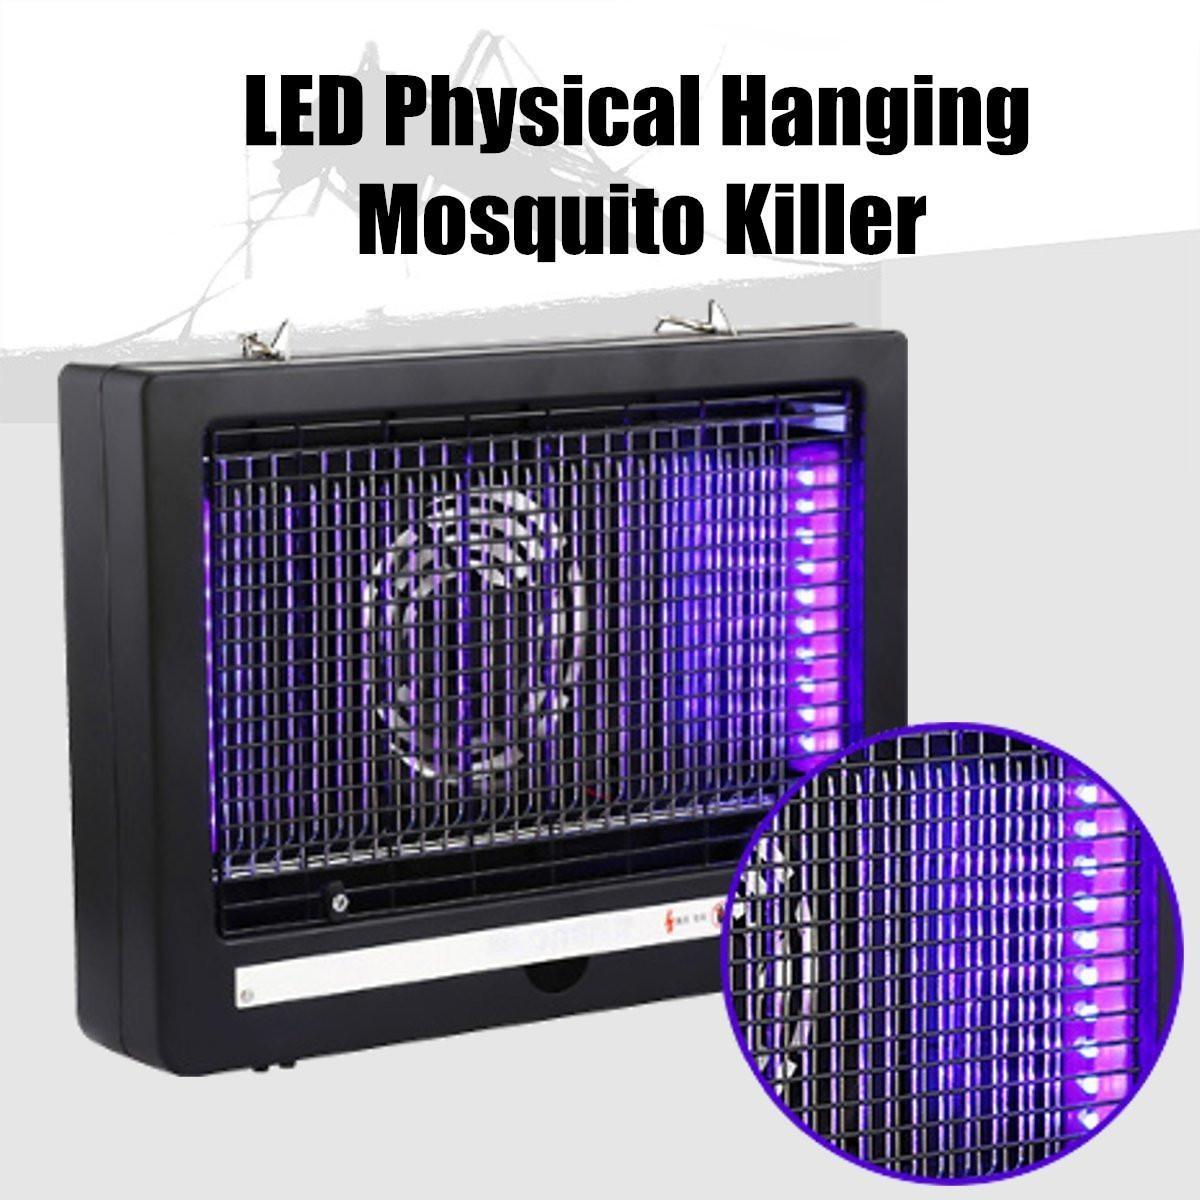 Generic Electric Industrial Pest Zapper Mosquito Killer